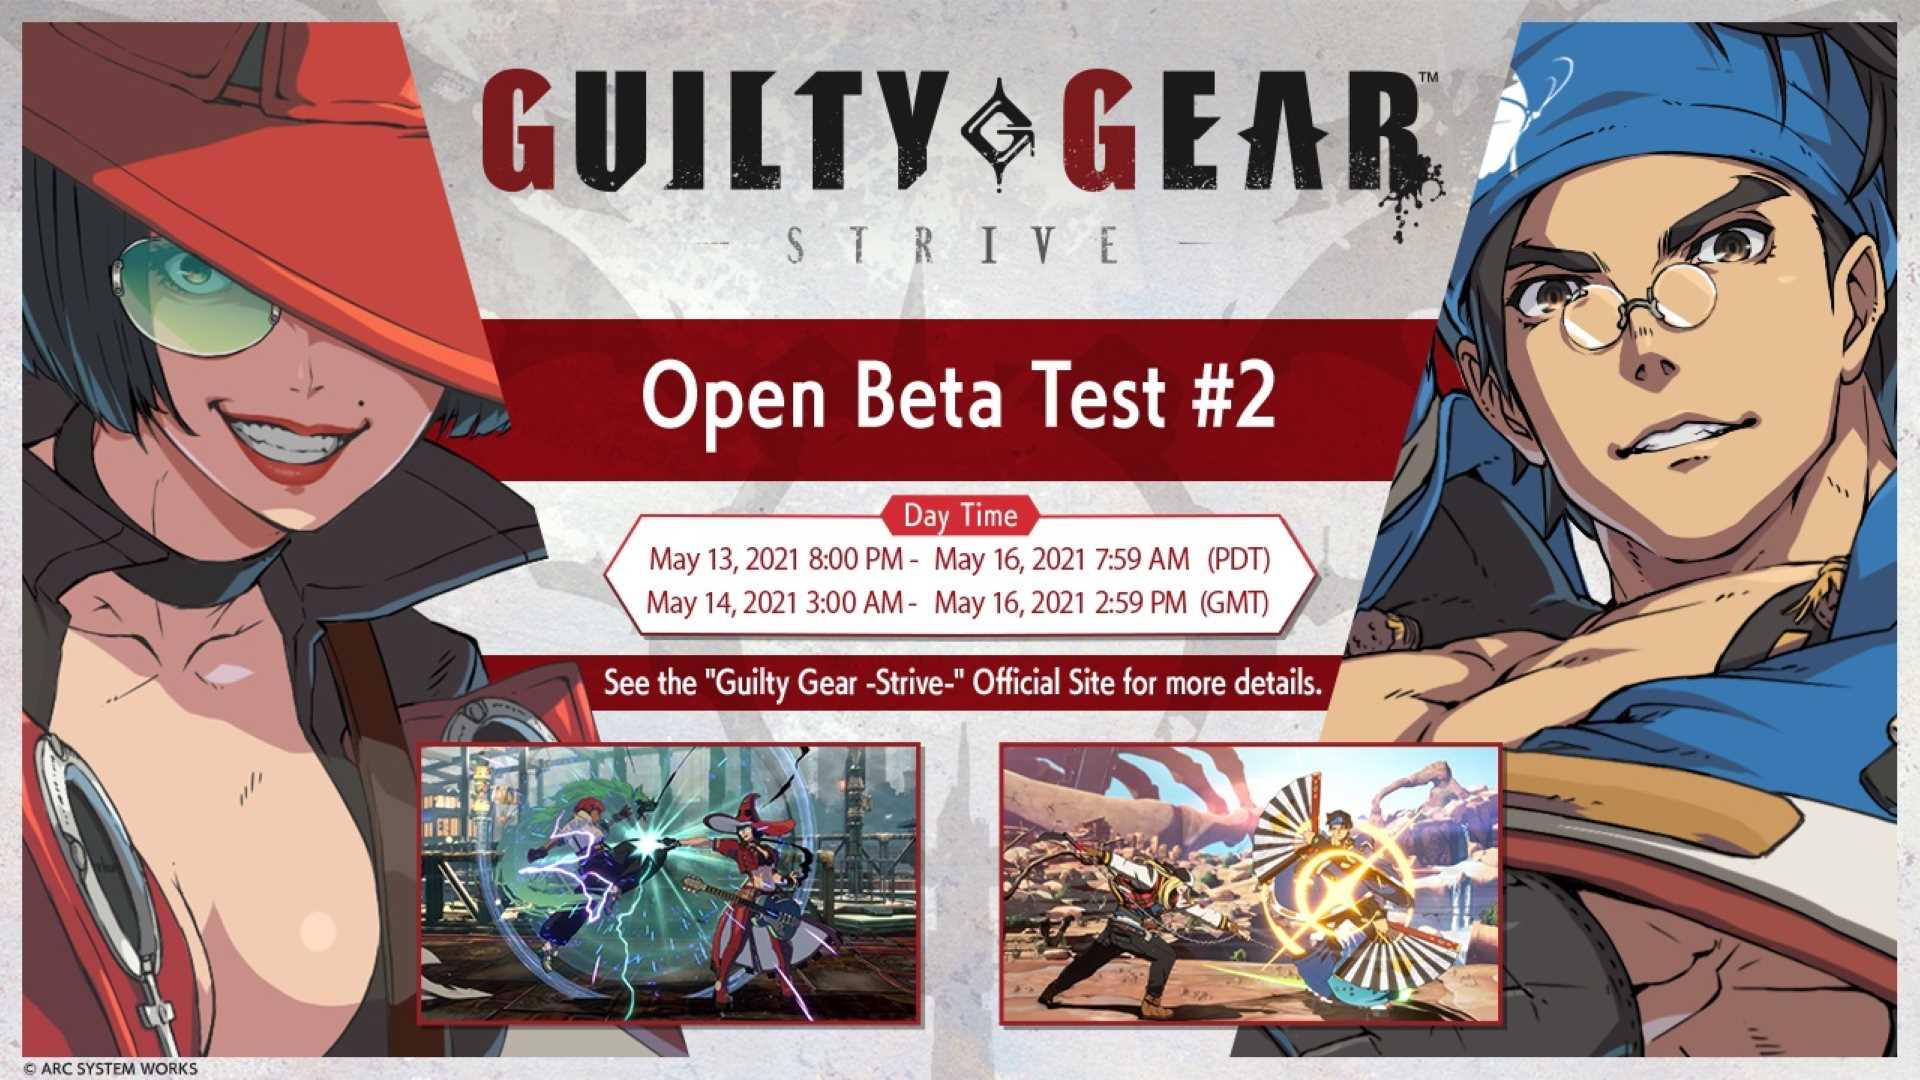 zweite Guilty Gear -Strive- Open-Beta - Termine